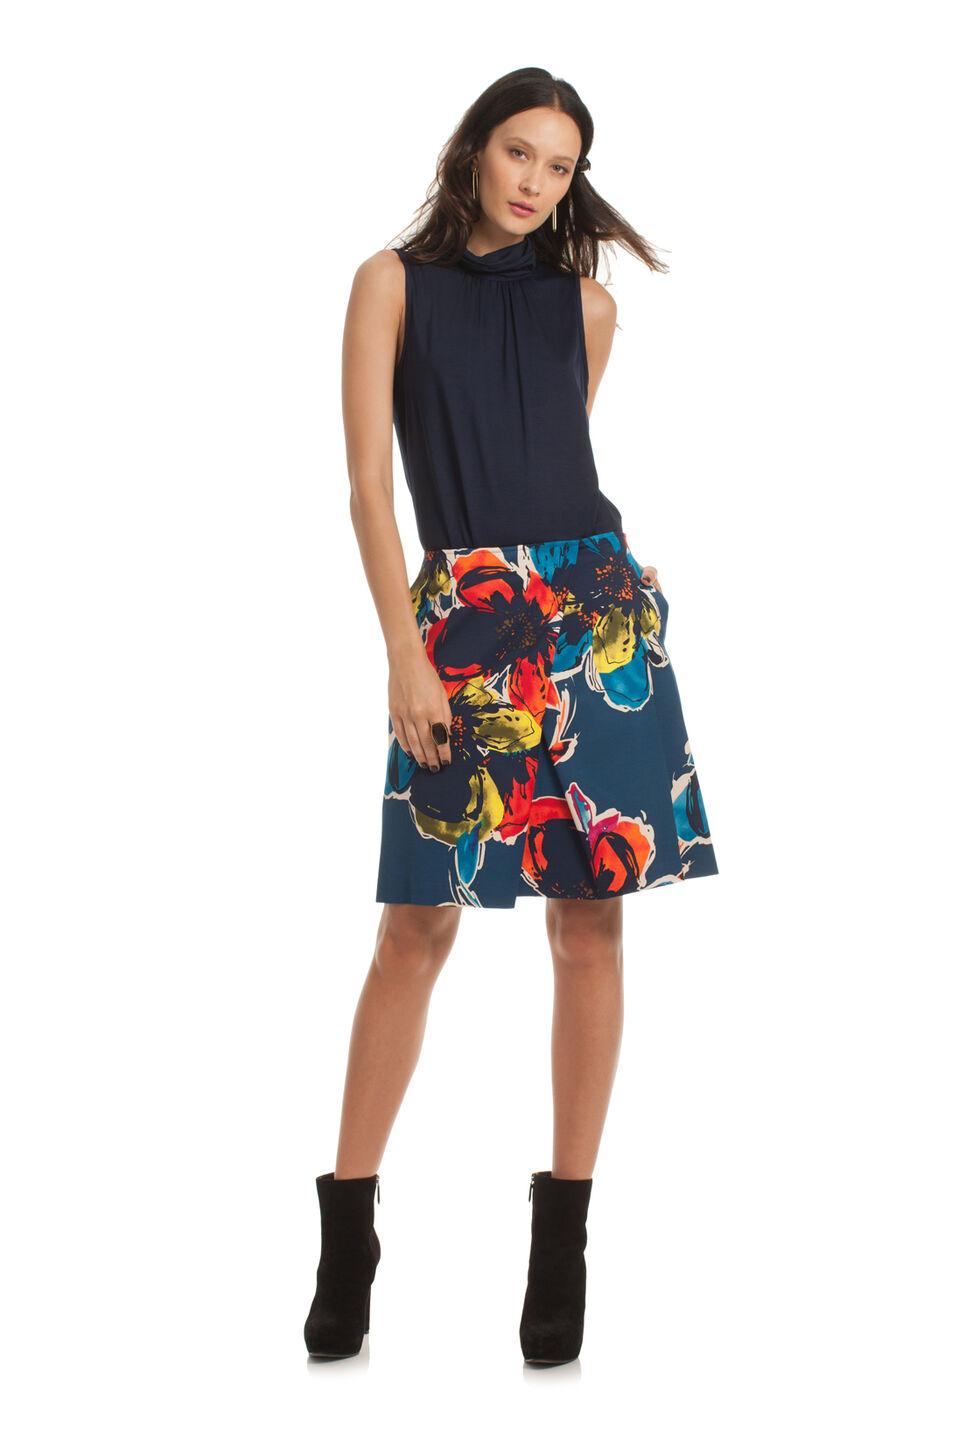 Epiphany Skirt